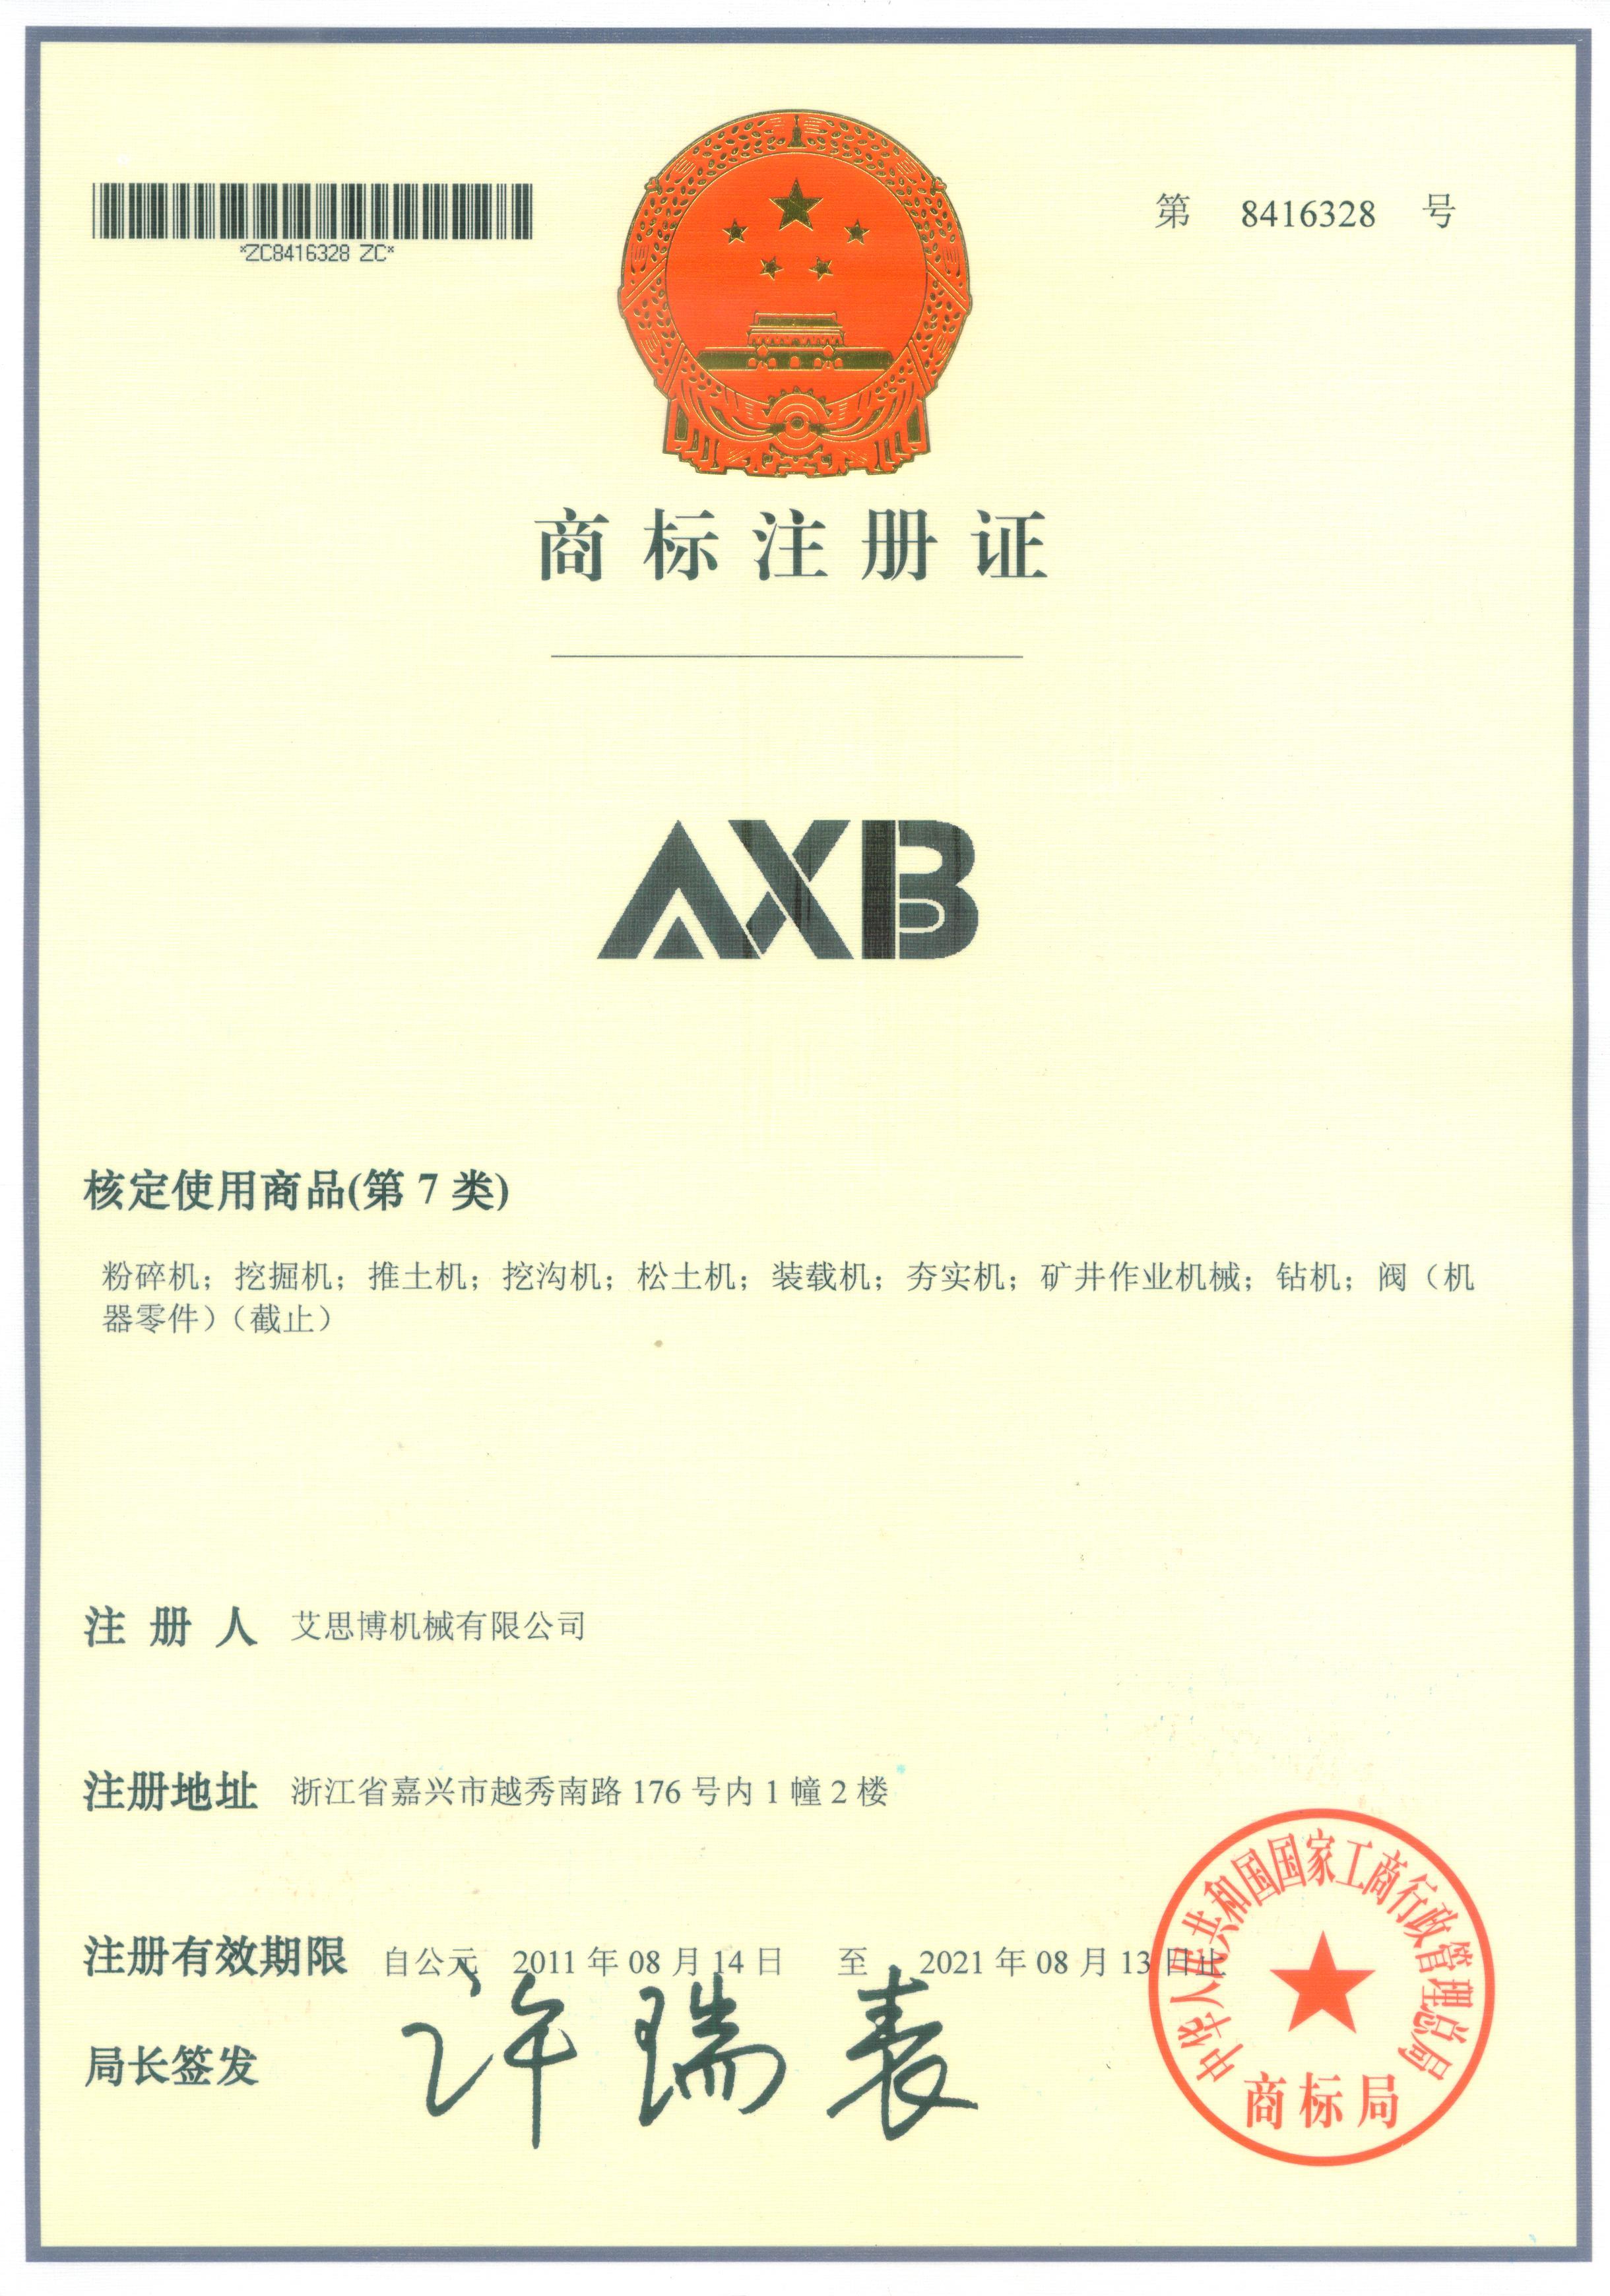 REGISTERED AXB BRAND